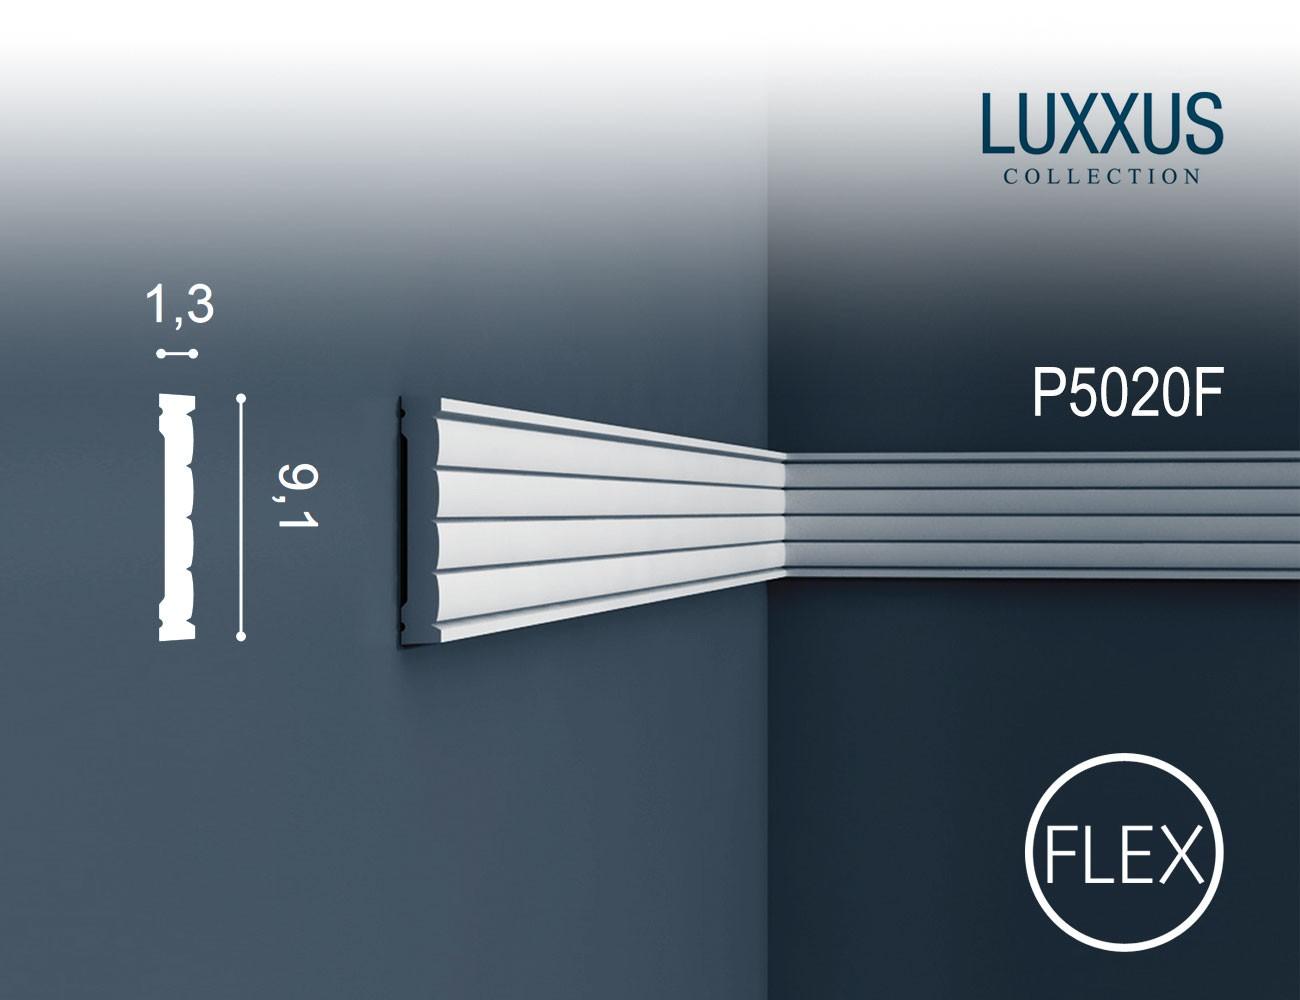 Orac decor p5020 luxxus flexi friesleiste wand leiste stuck dekor zierprofil 2 m original orac - Wand zierleiste ...